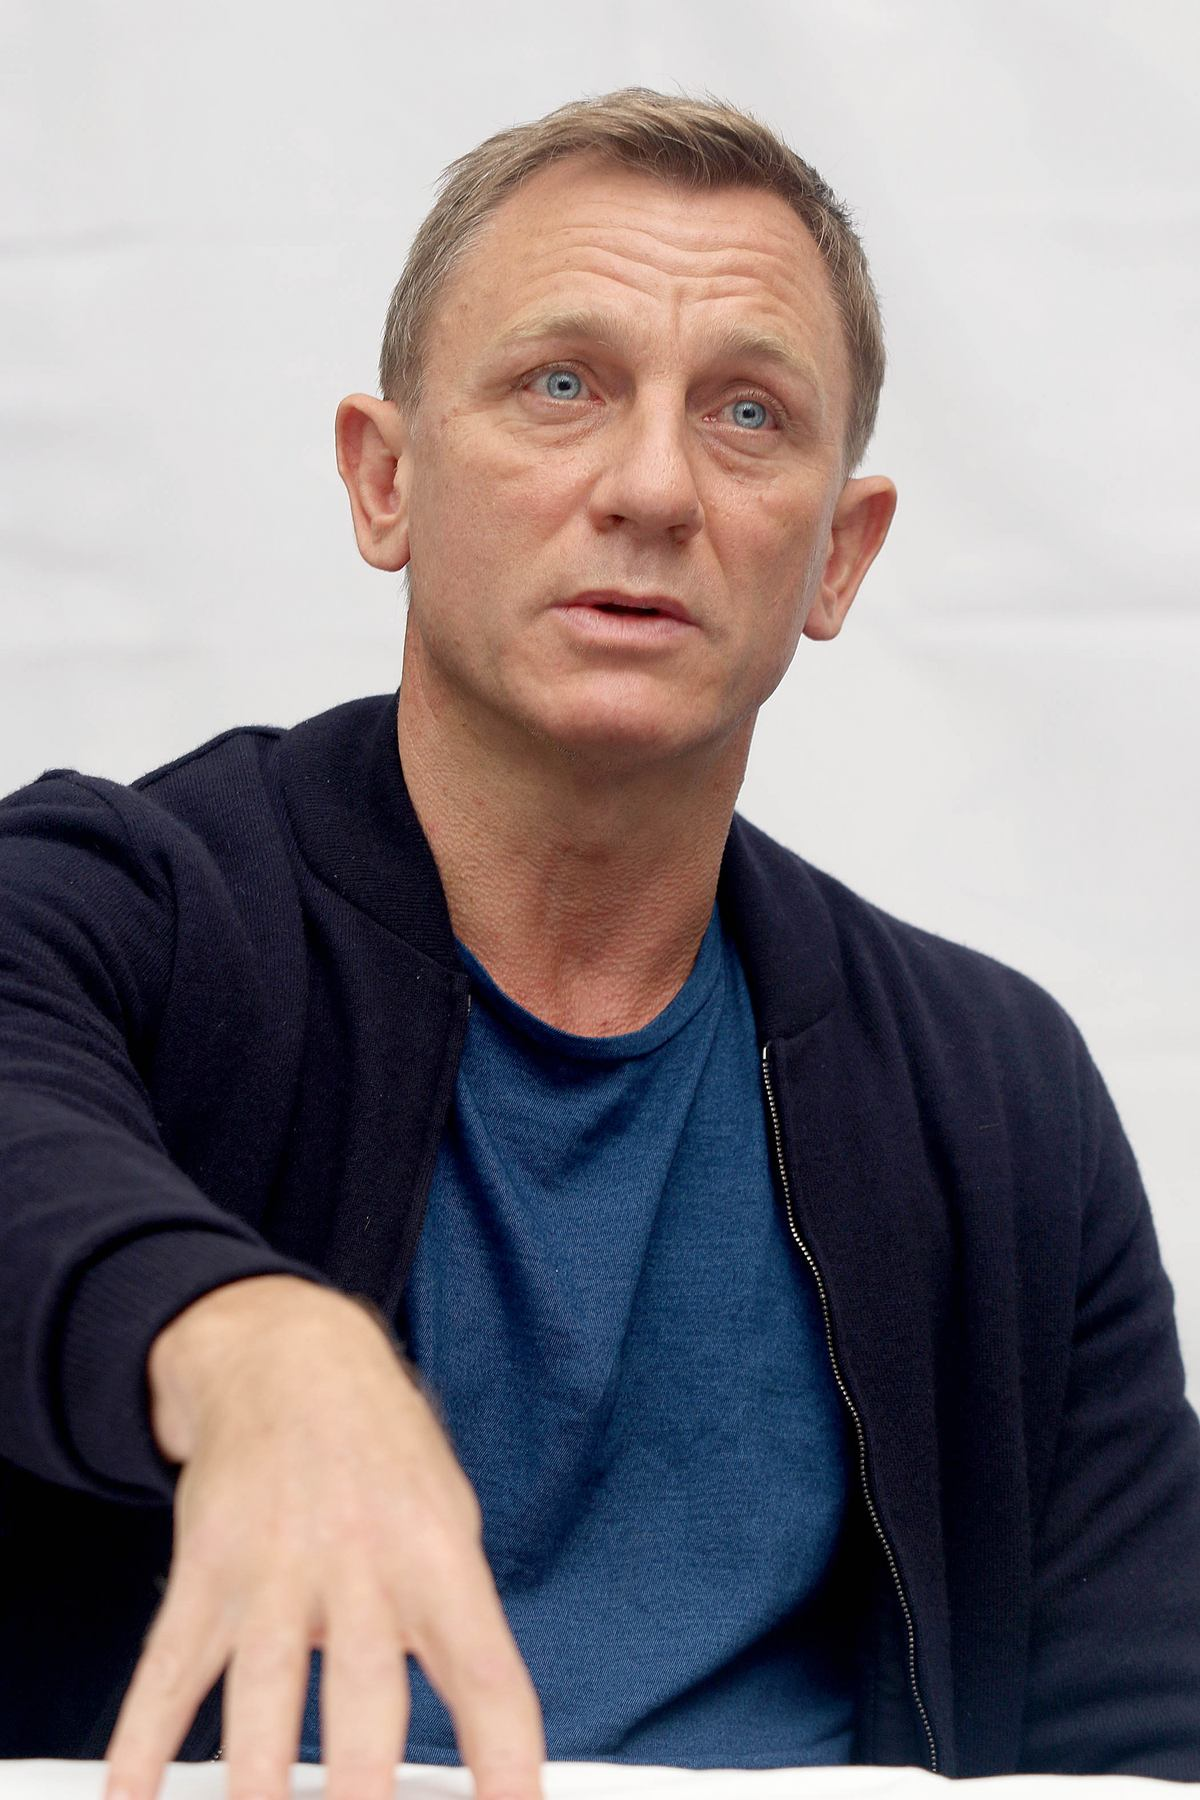 Daniel Craig at Spectr...